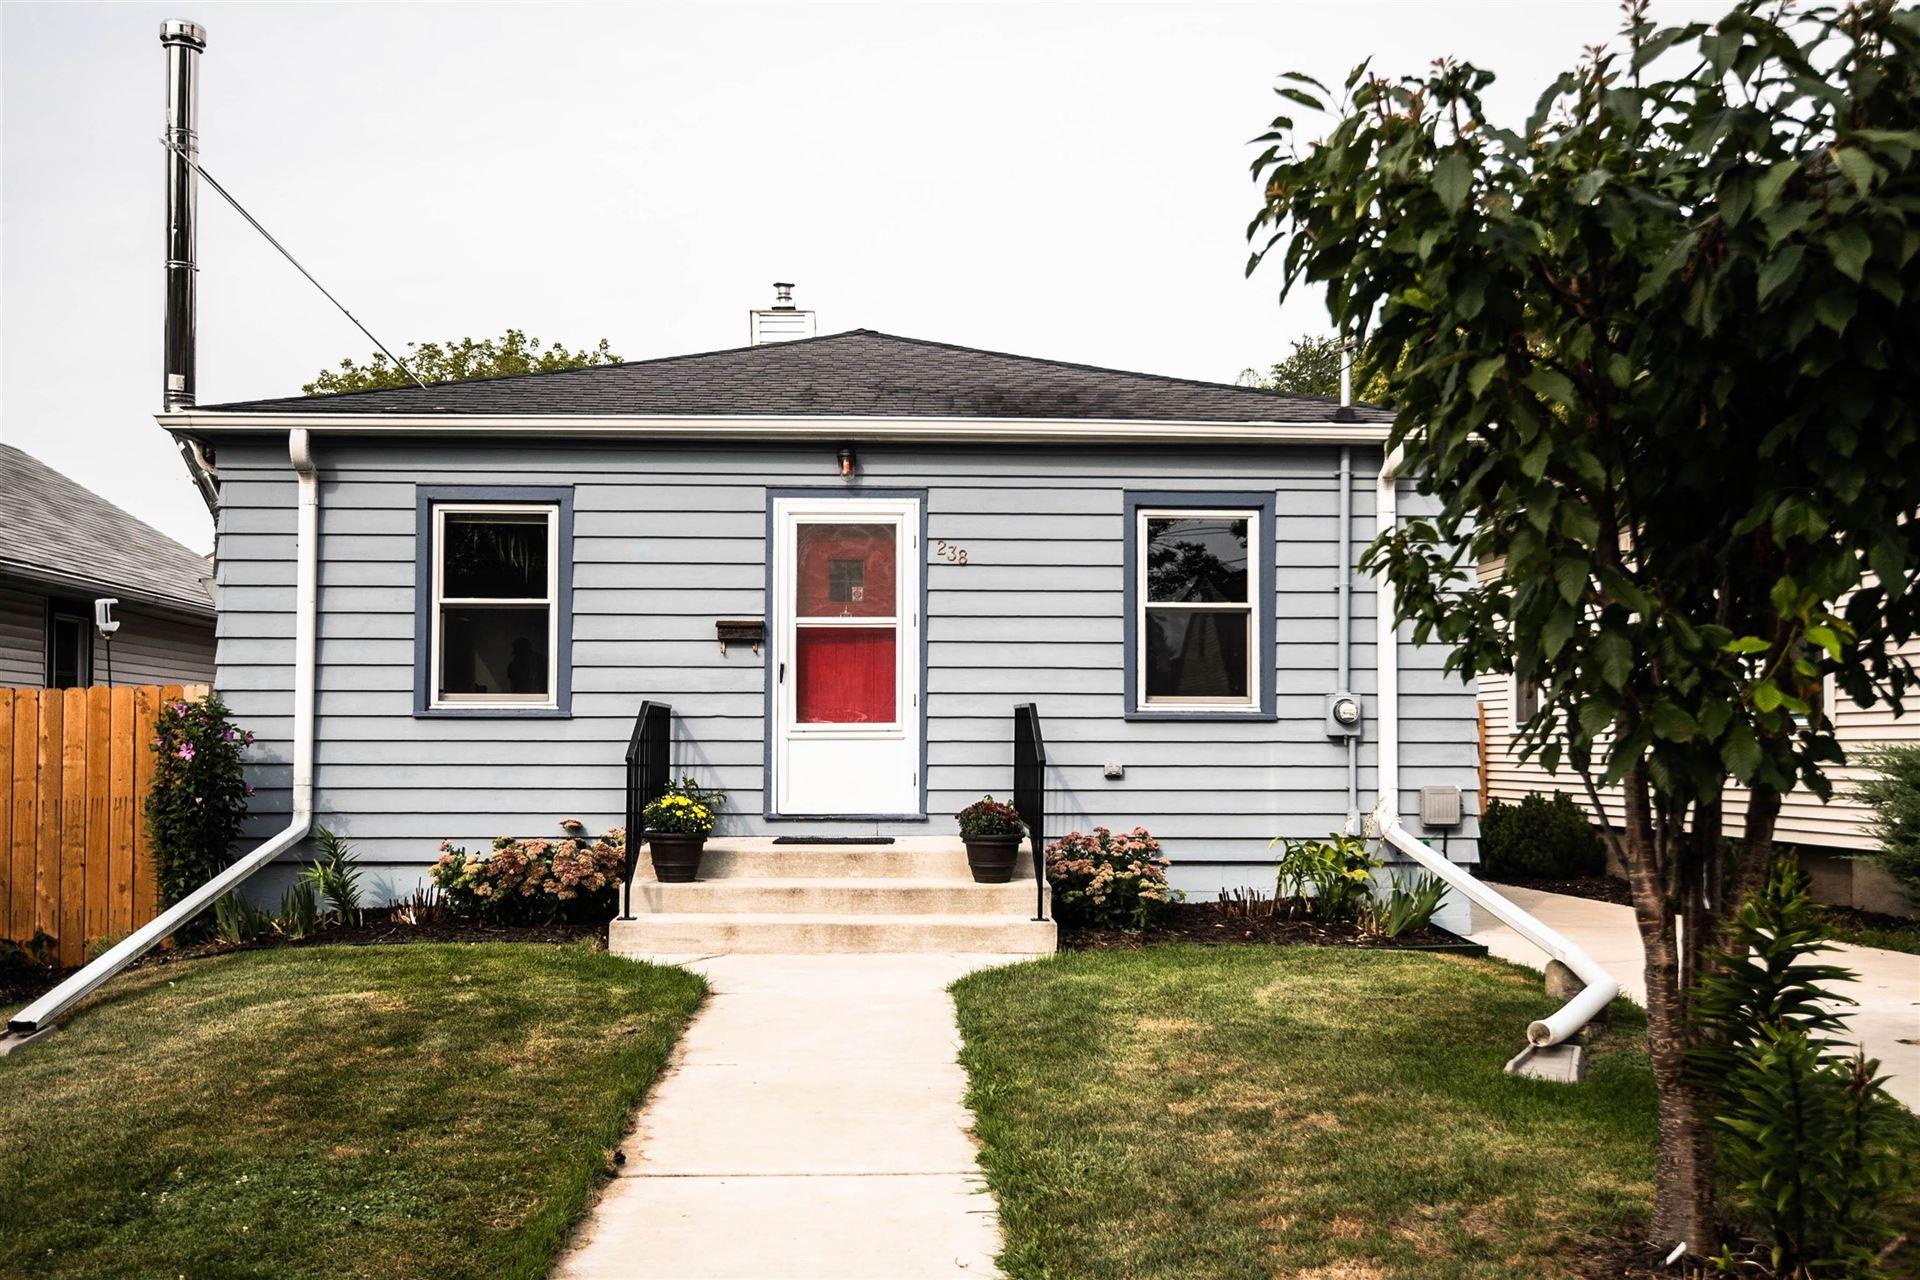 238 Oak St, Madison, WI 53704 - #: 1919318